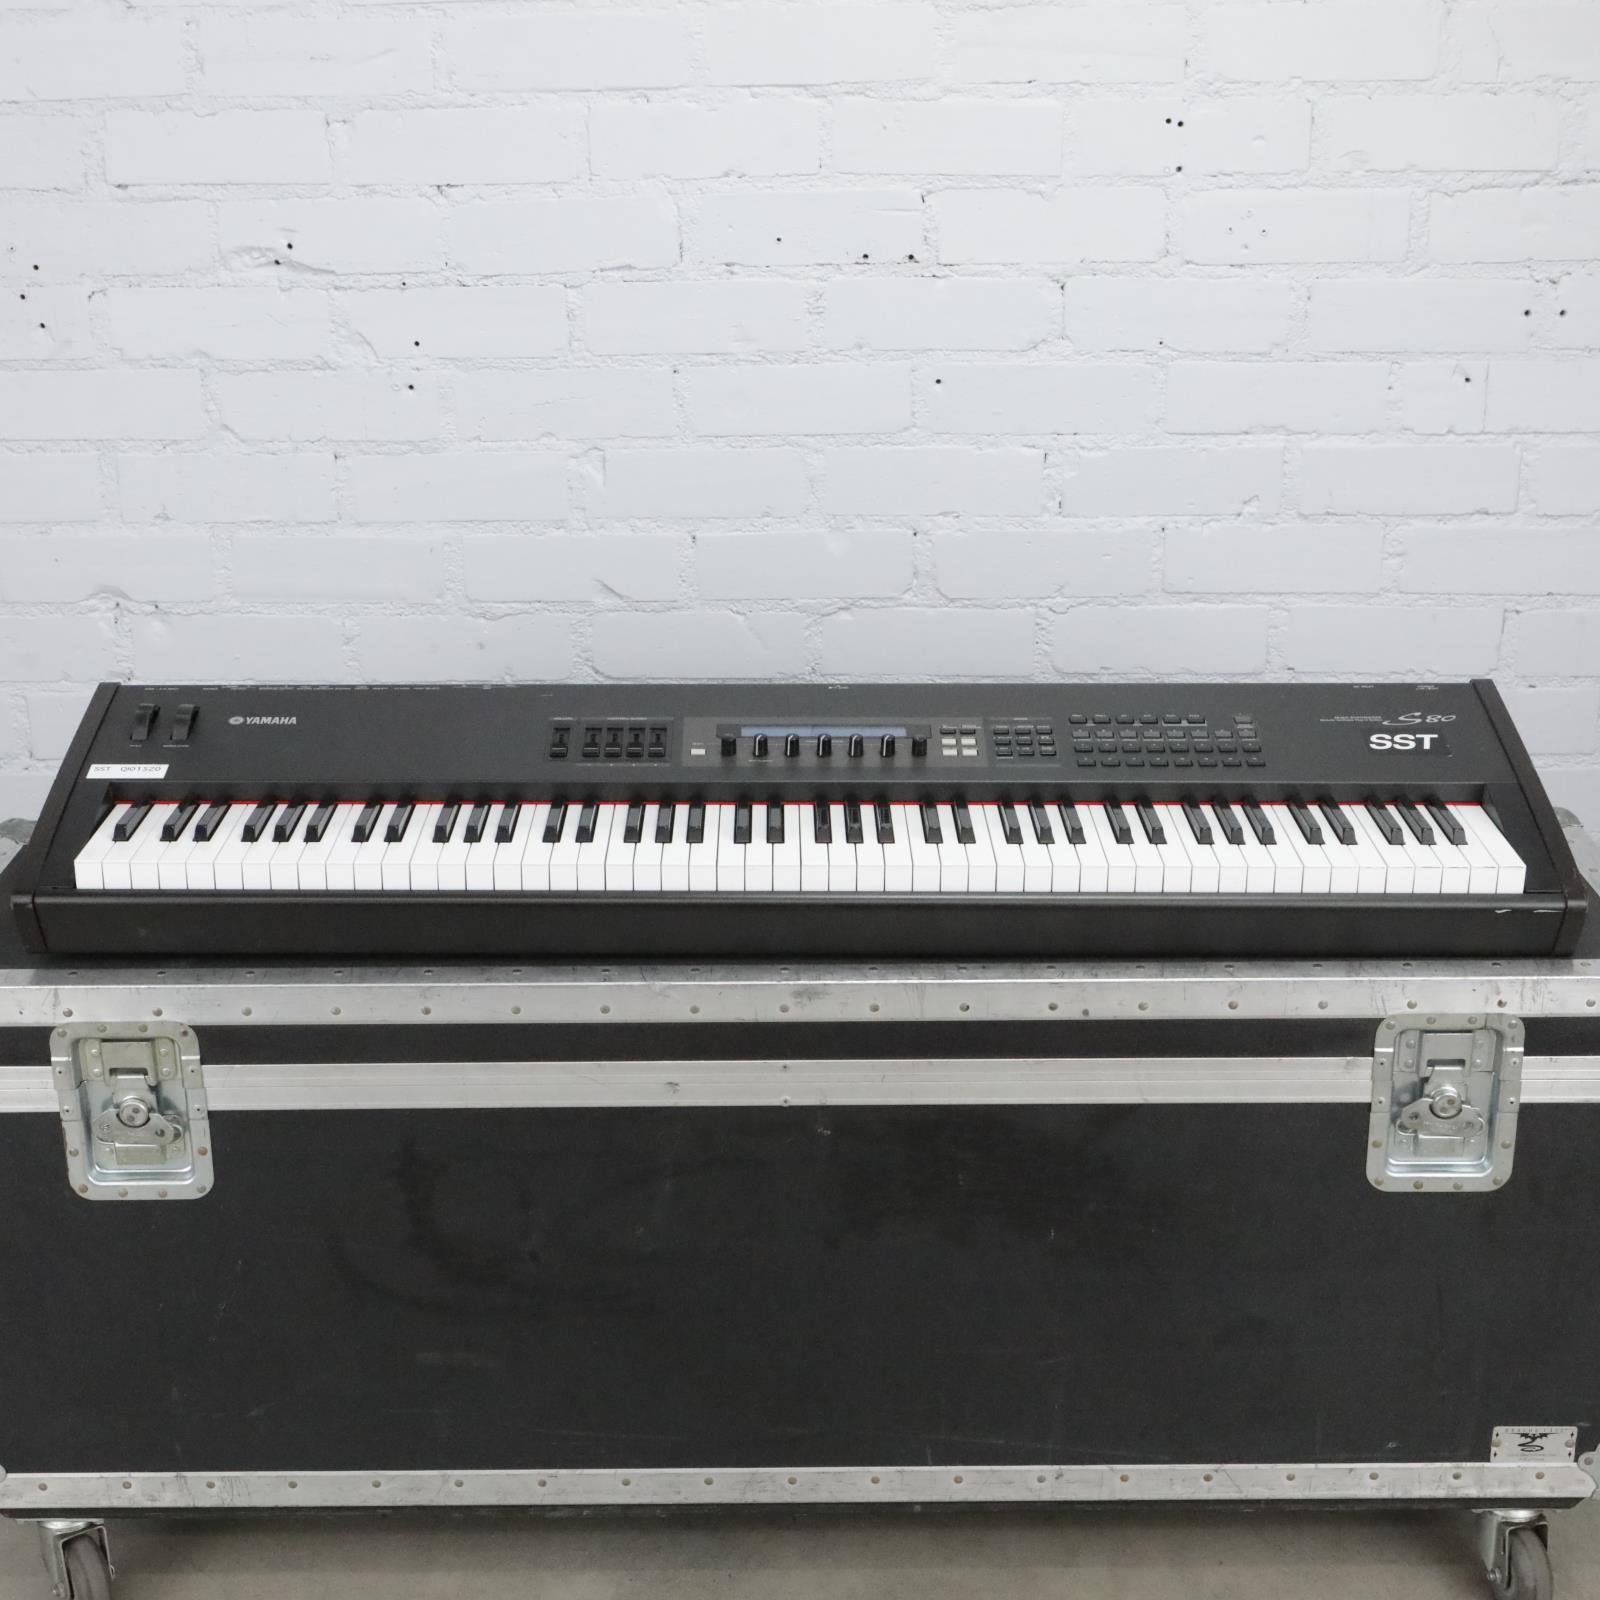 Yamaha S80 Keyboard 88 Note Weighted Electronic Piano Synthesizer #40723